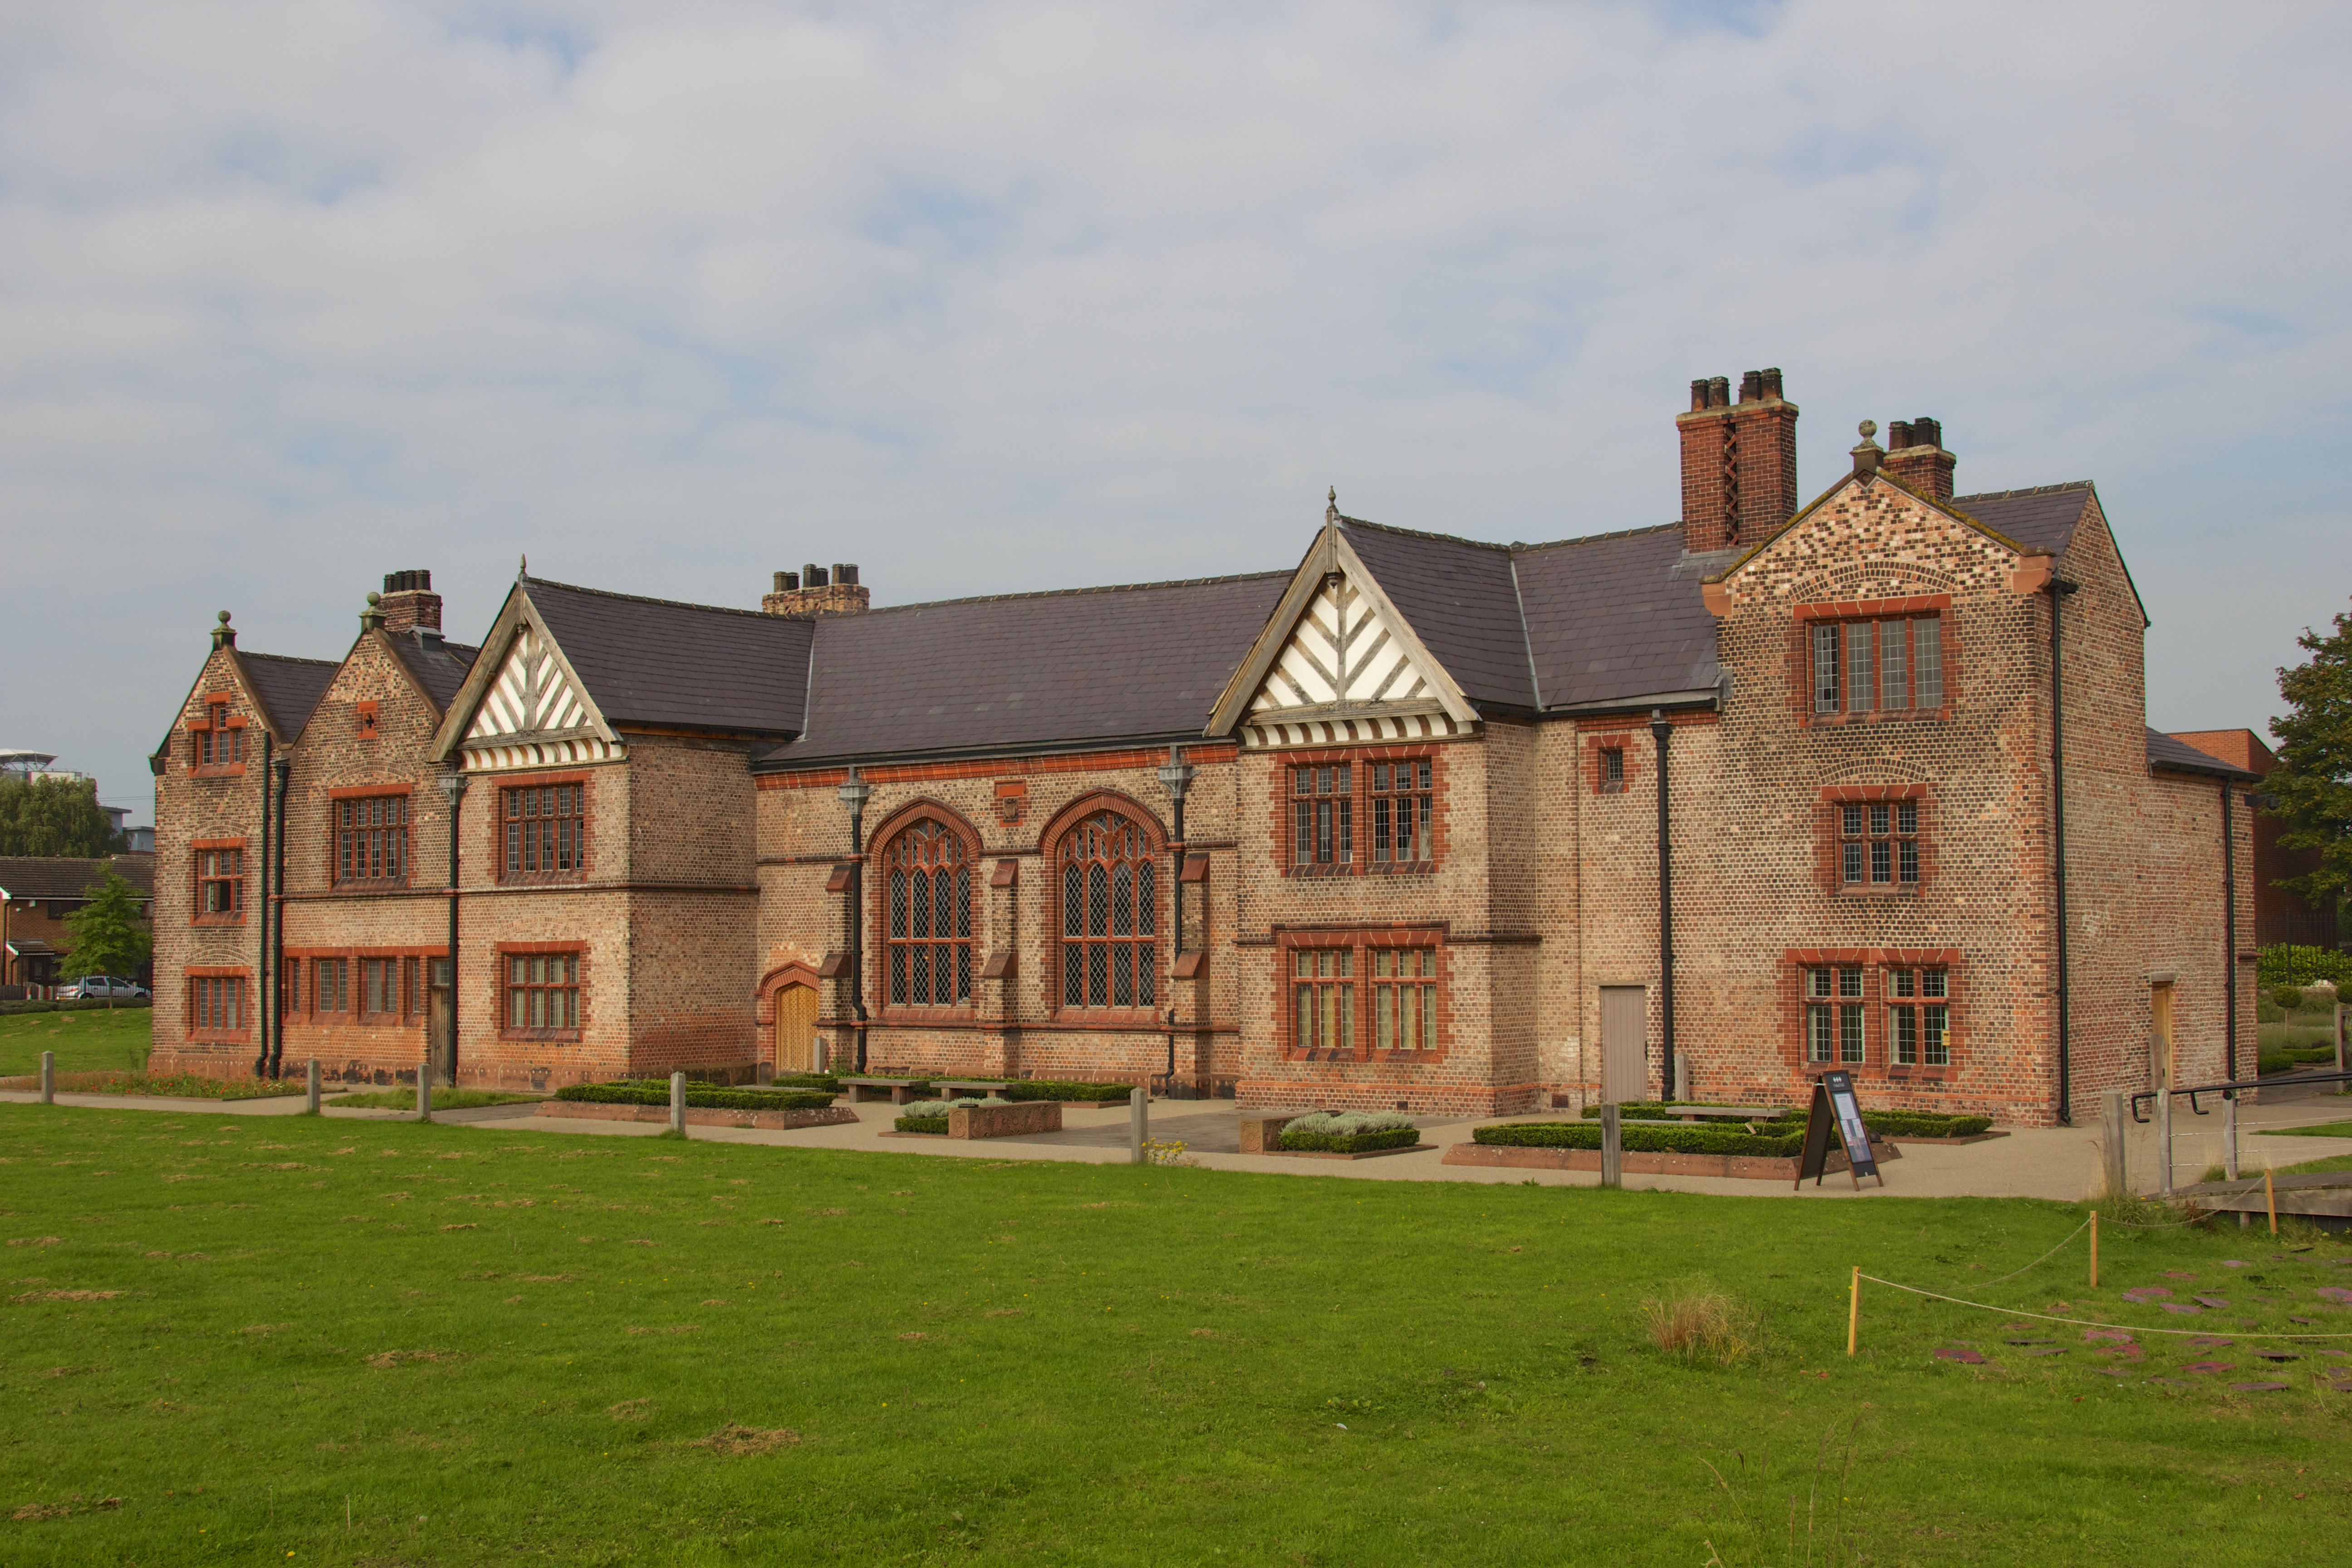 2-storey building